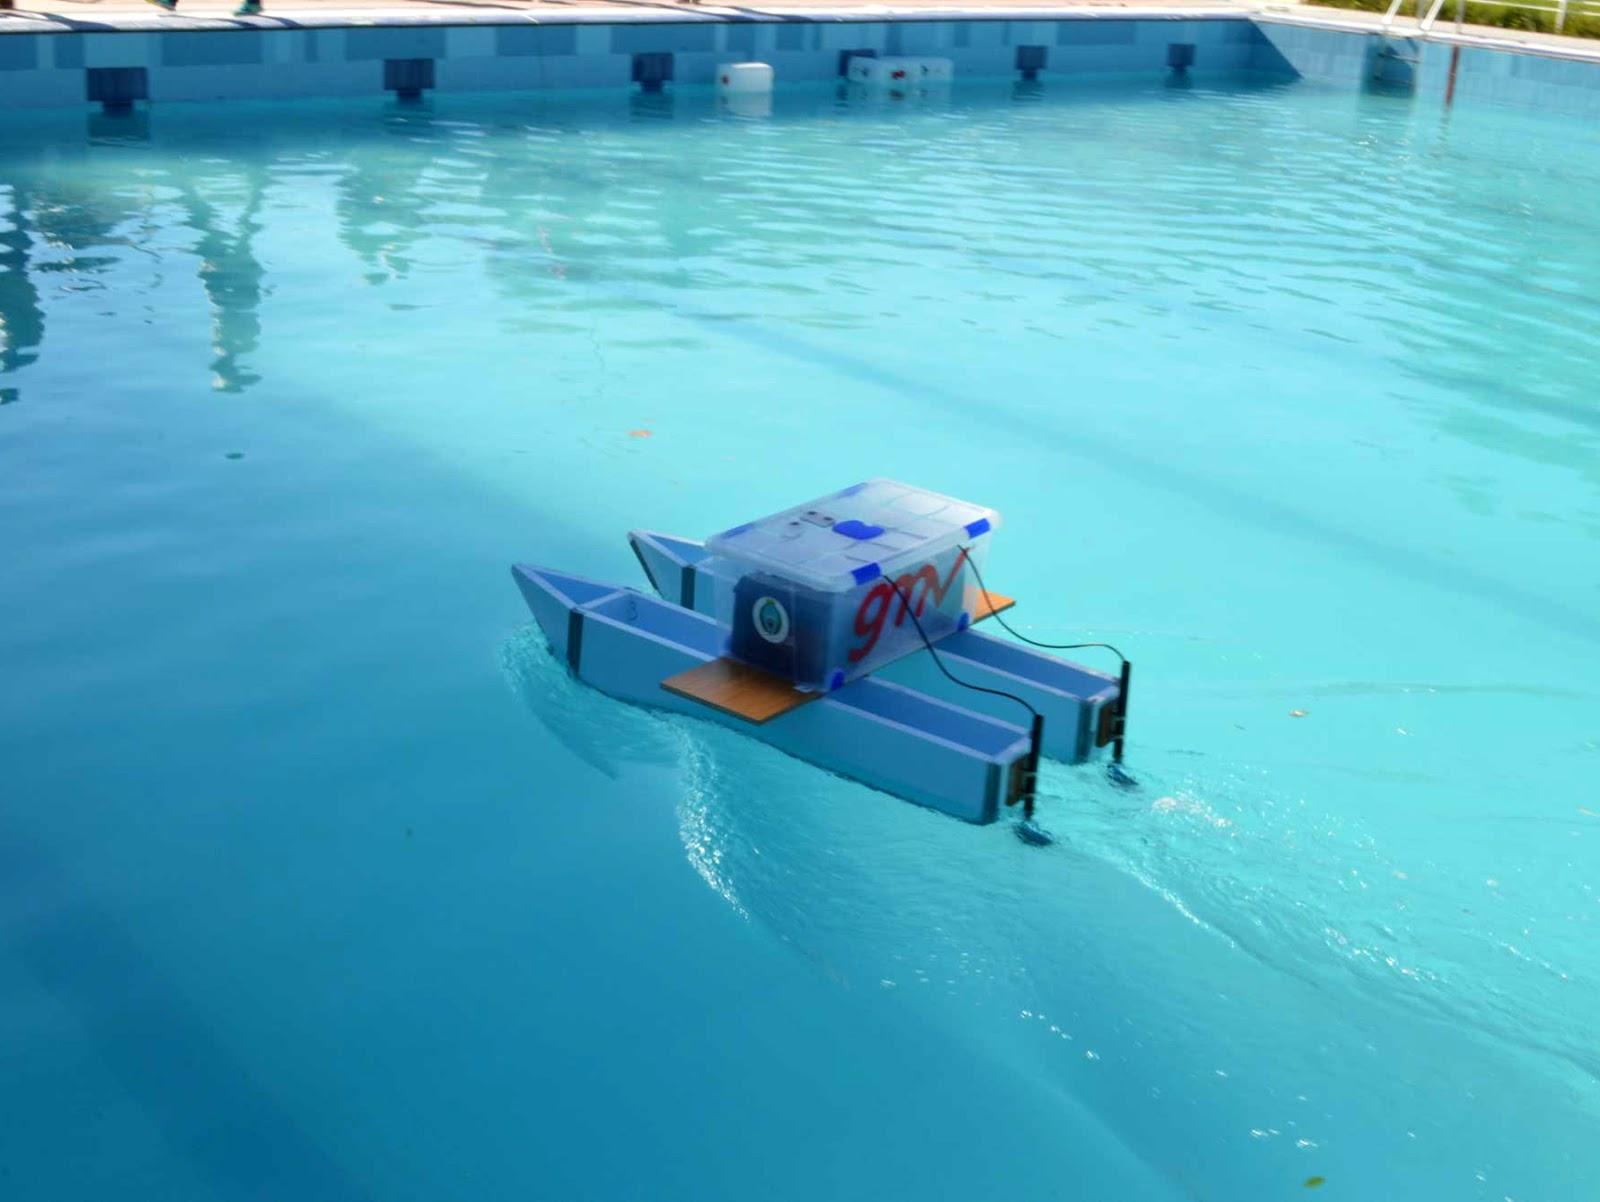 Pruebas de rob tica submarina en la piscina municipal de villaca as toledo news - Piscina municipal toledo ...